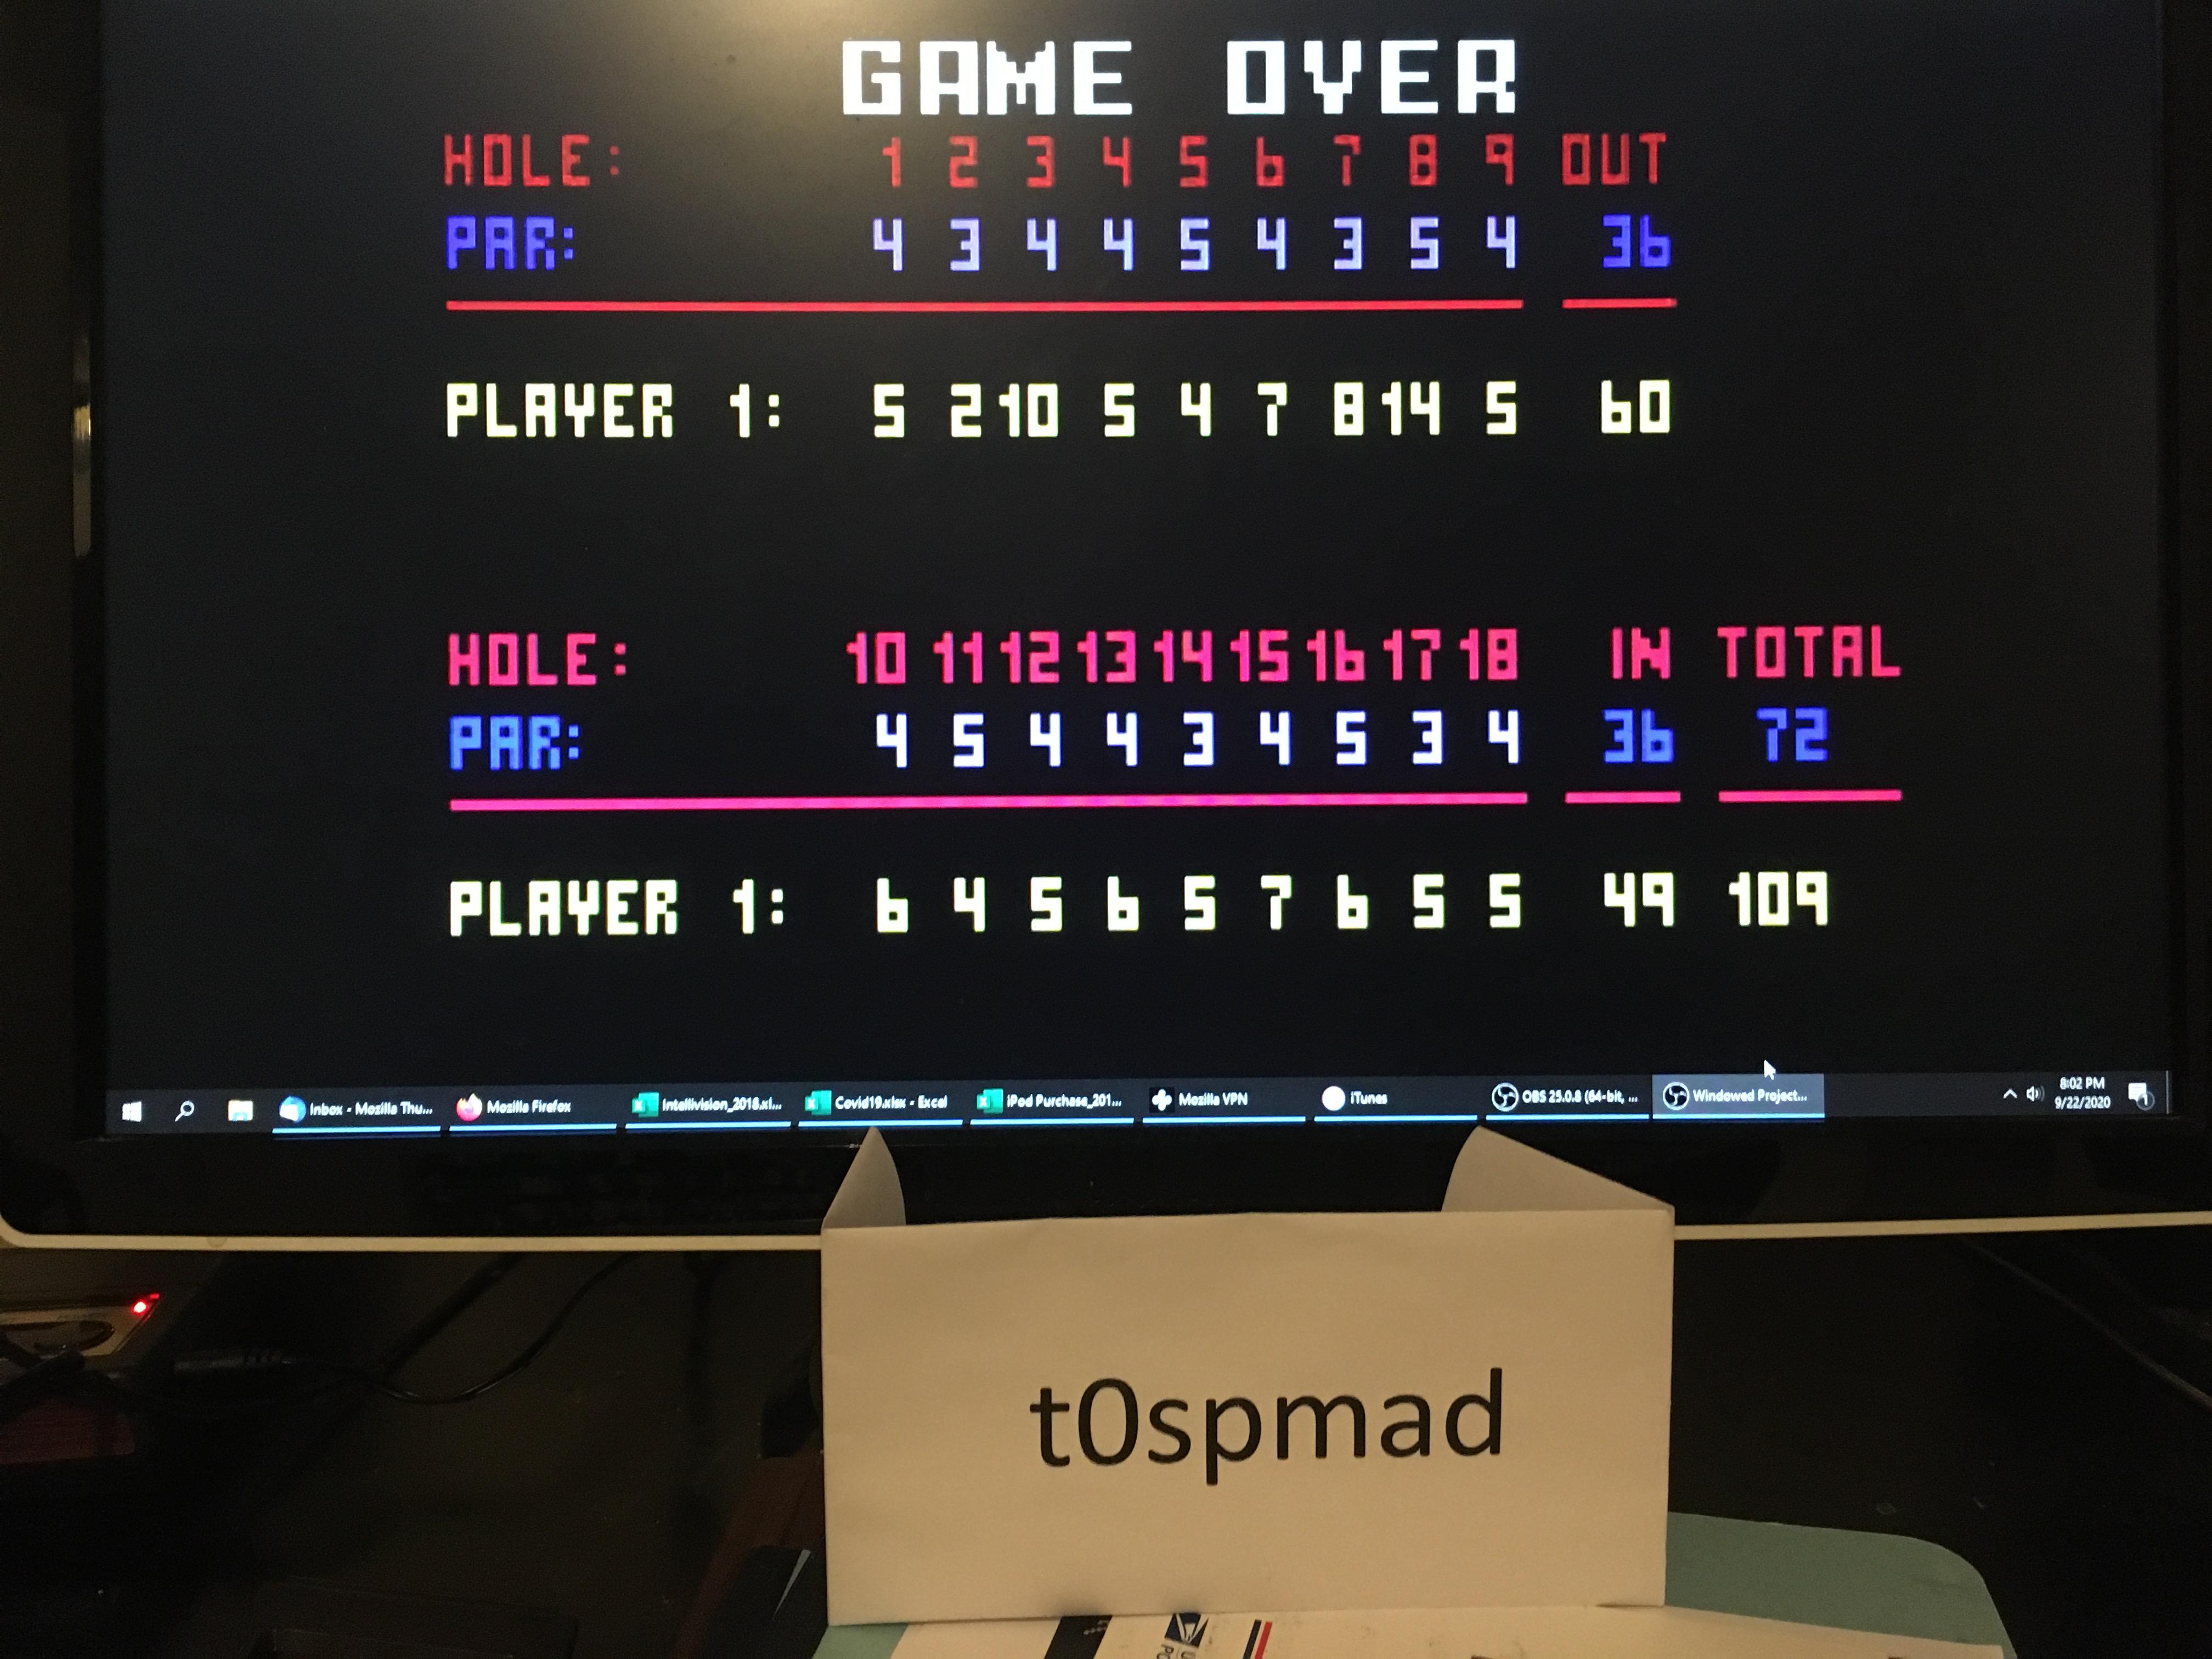 Chip Shot: Super Pro Golf [Invitational Open: 18 Holes] 109 points